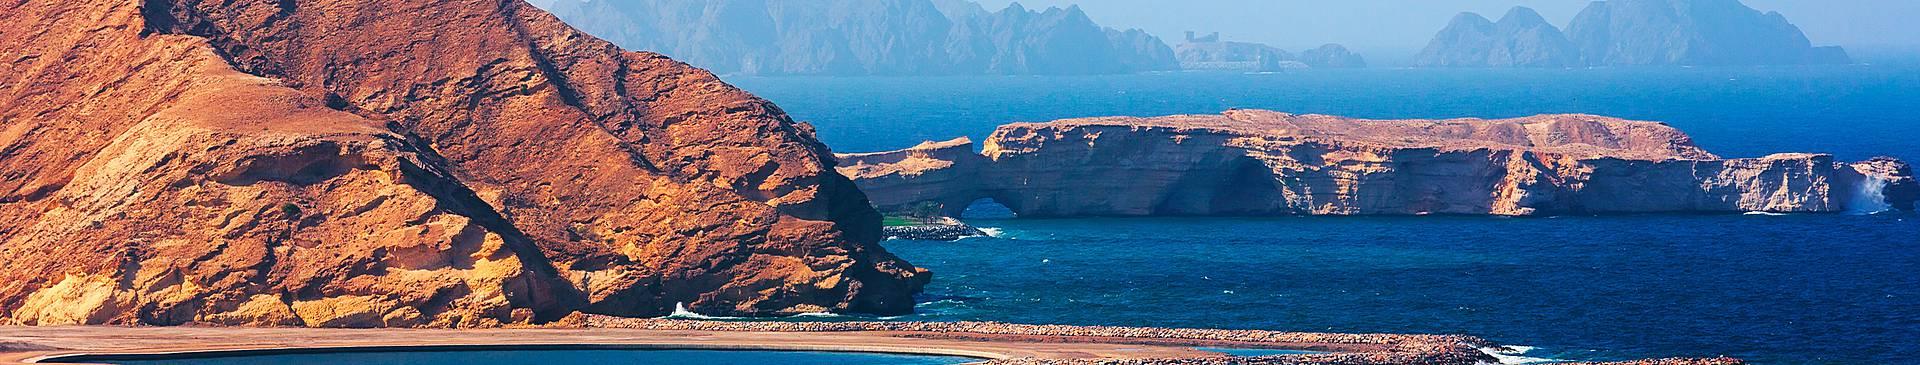 Naturreisen Oman